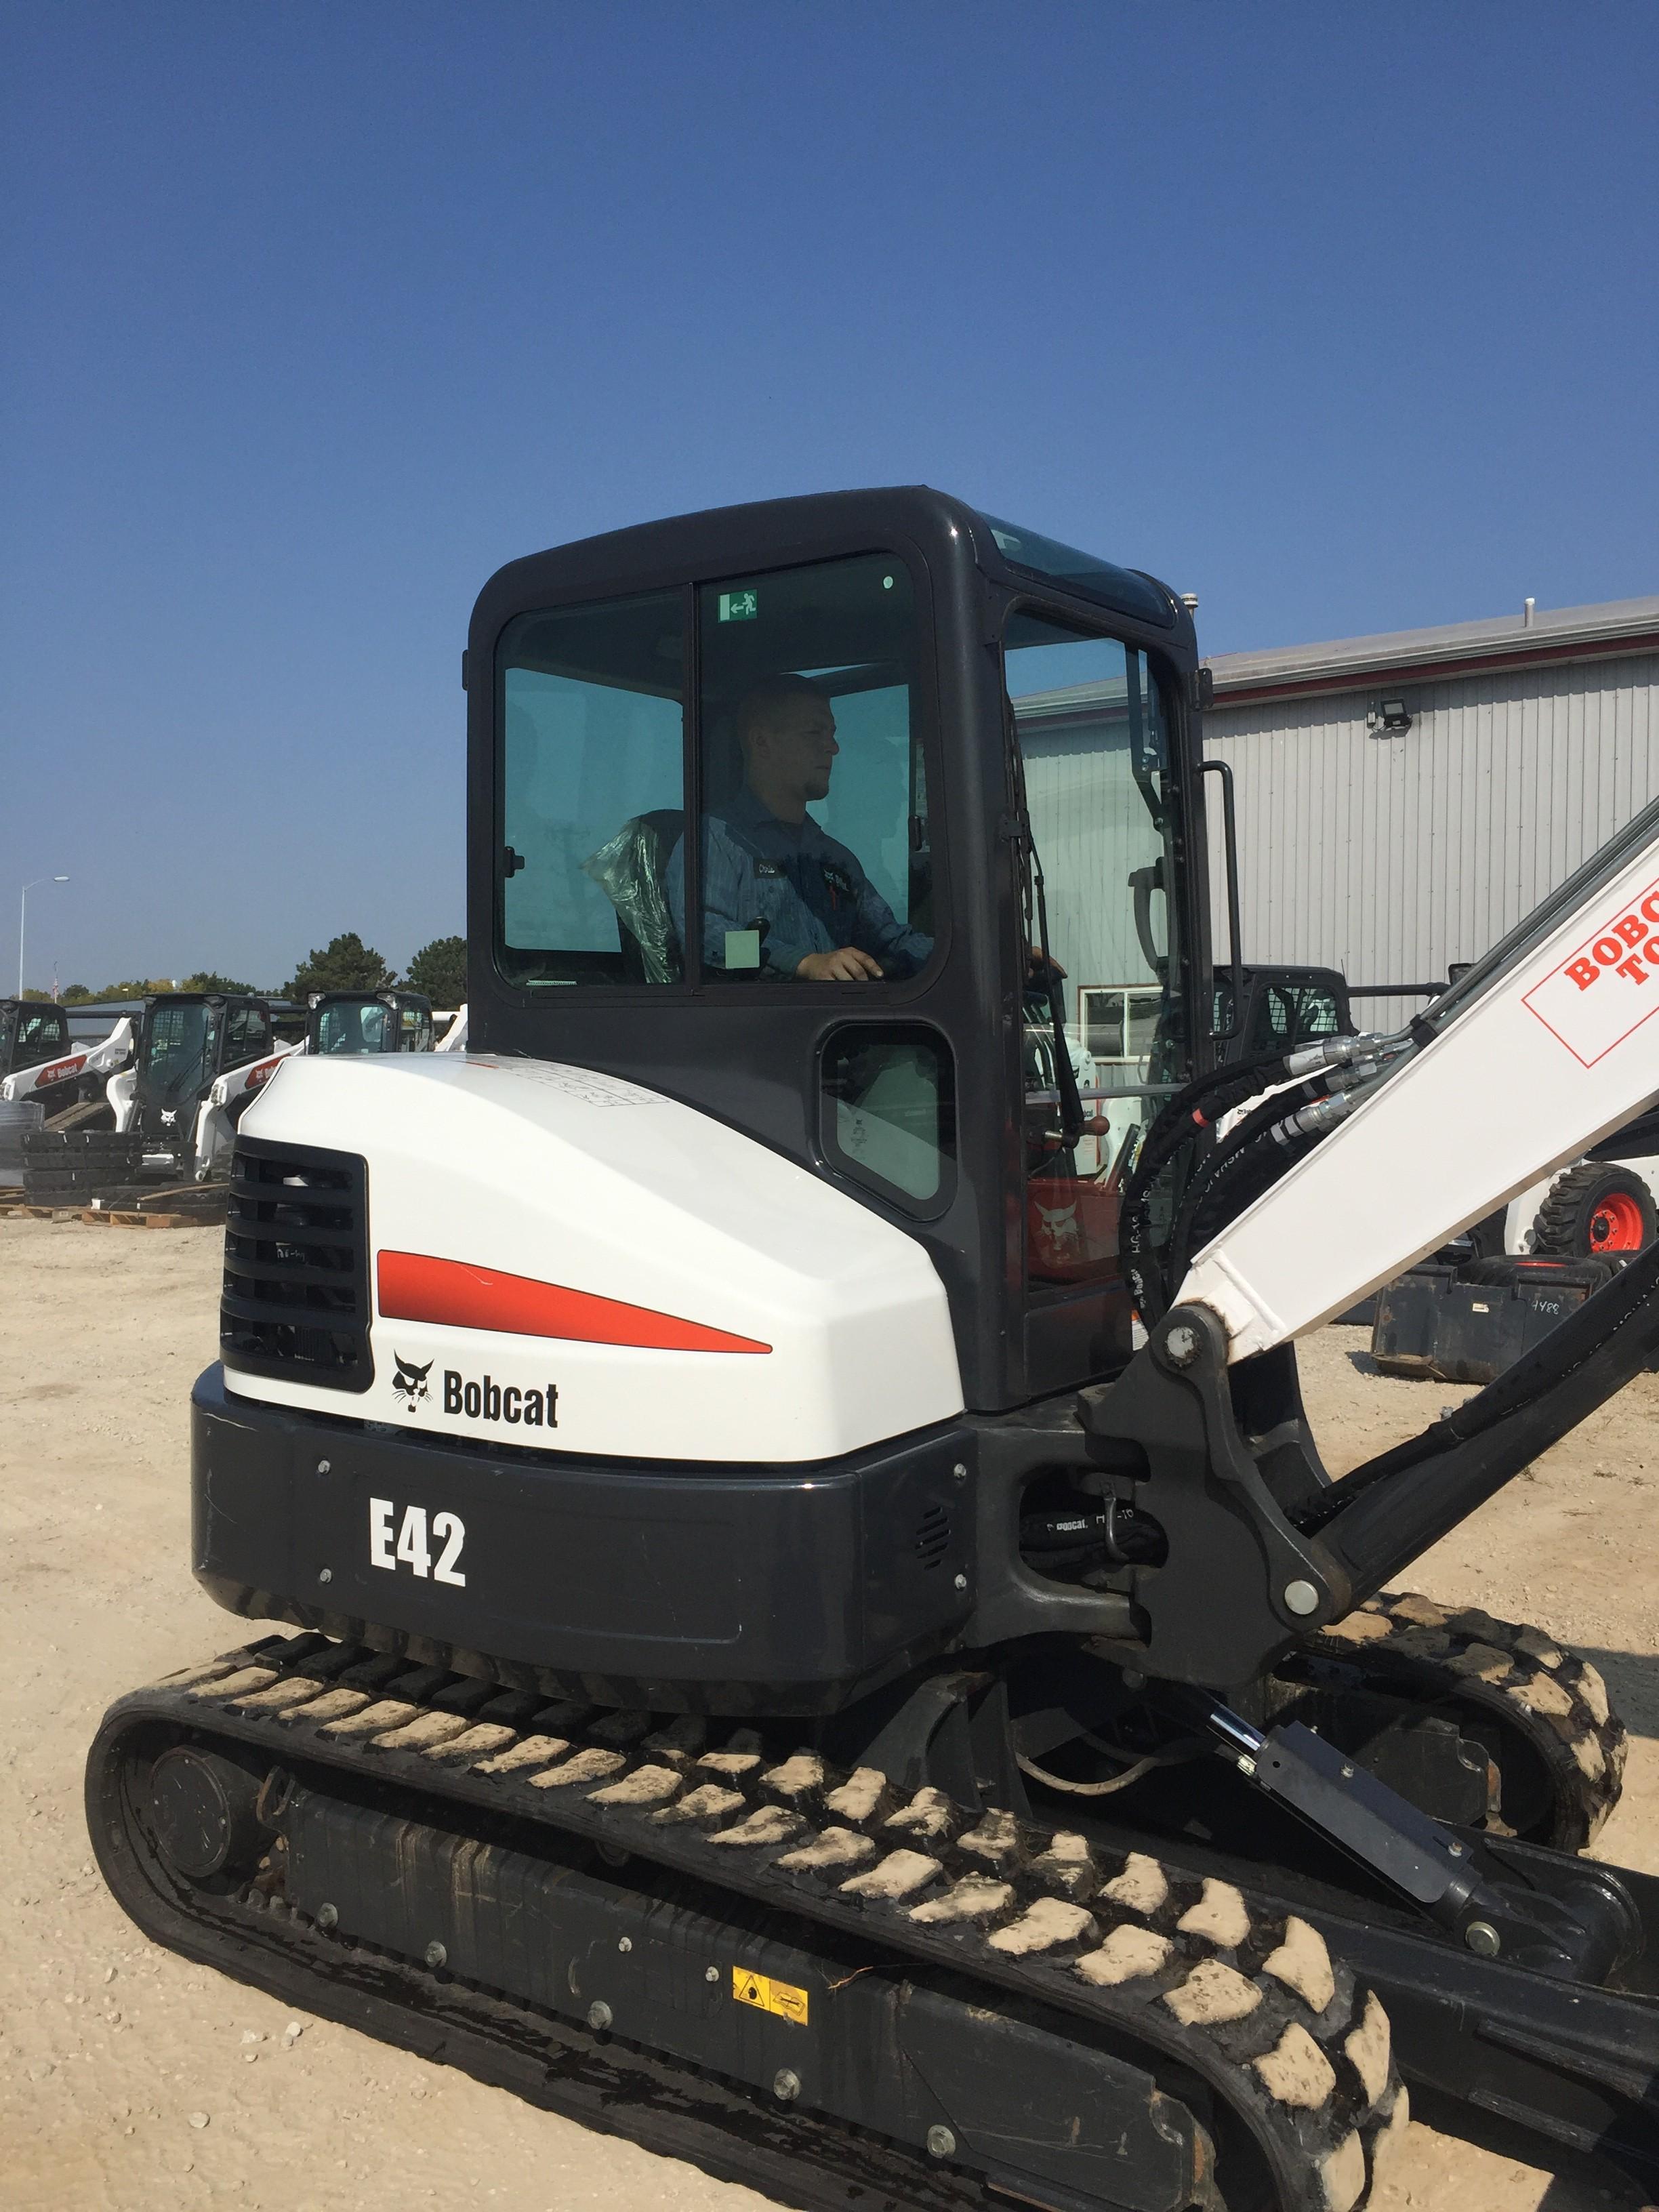 Used, 2019, Bobcat, E42 Long Arm, Excavators